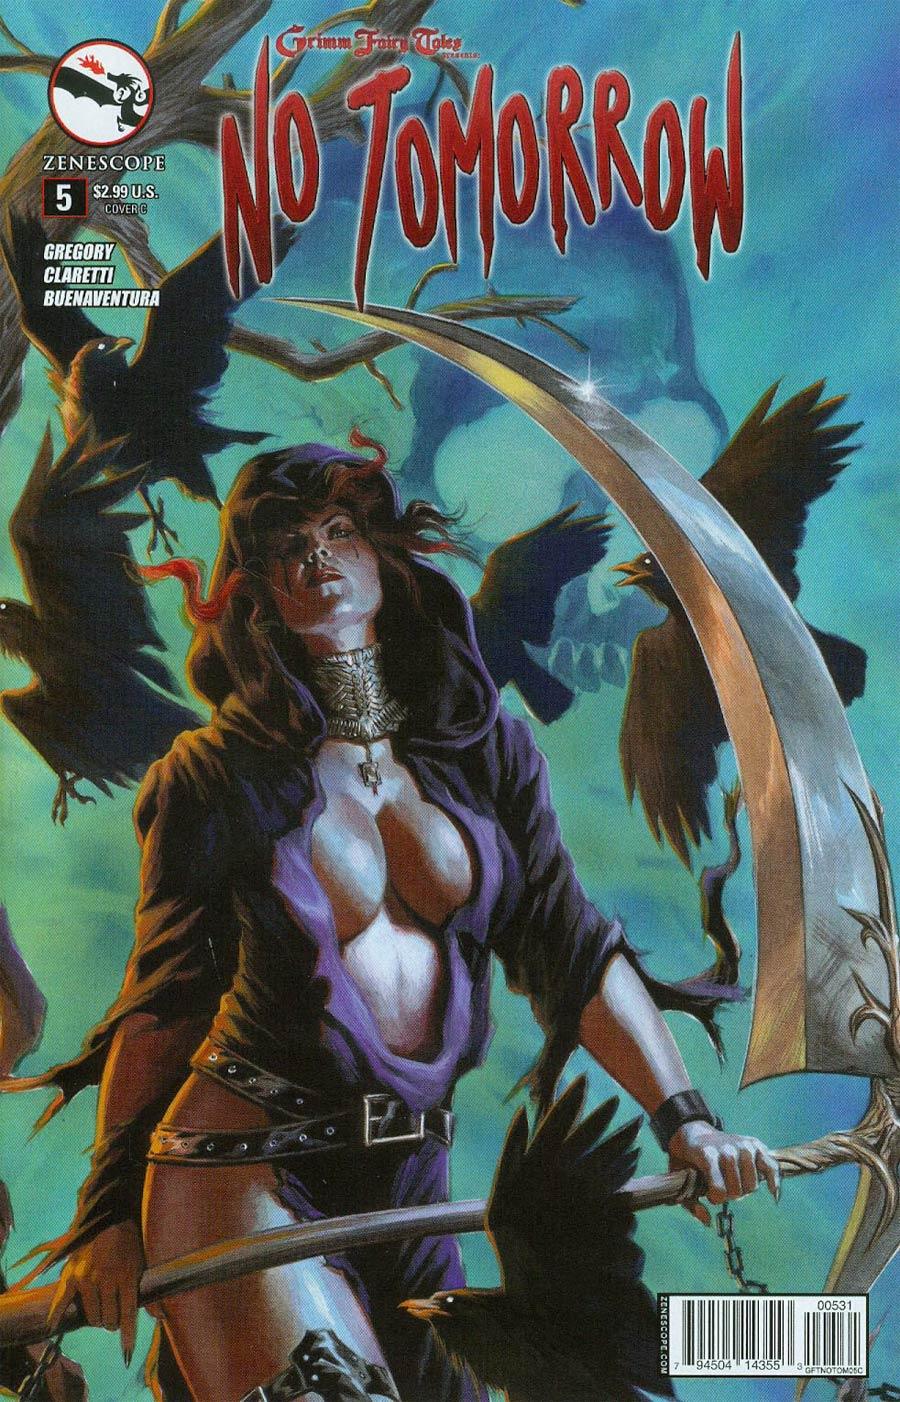 Grimm Fairy Tales Presents No Tomorrow #5 Cover C Felipe Massafera